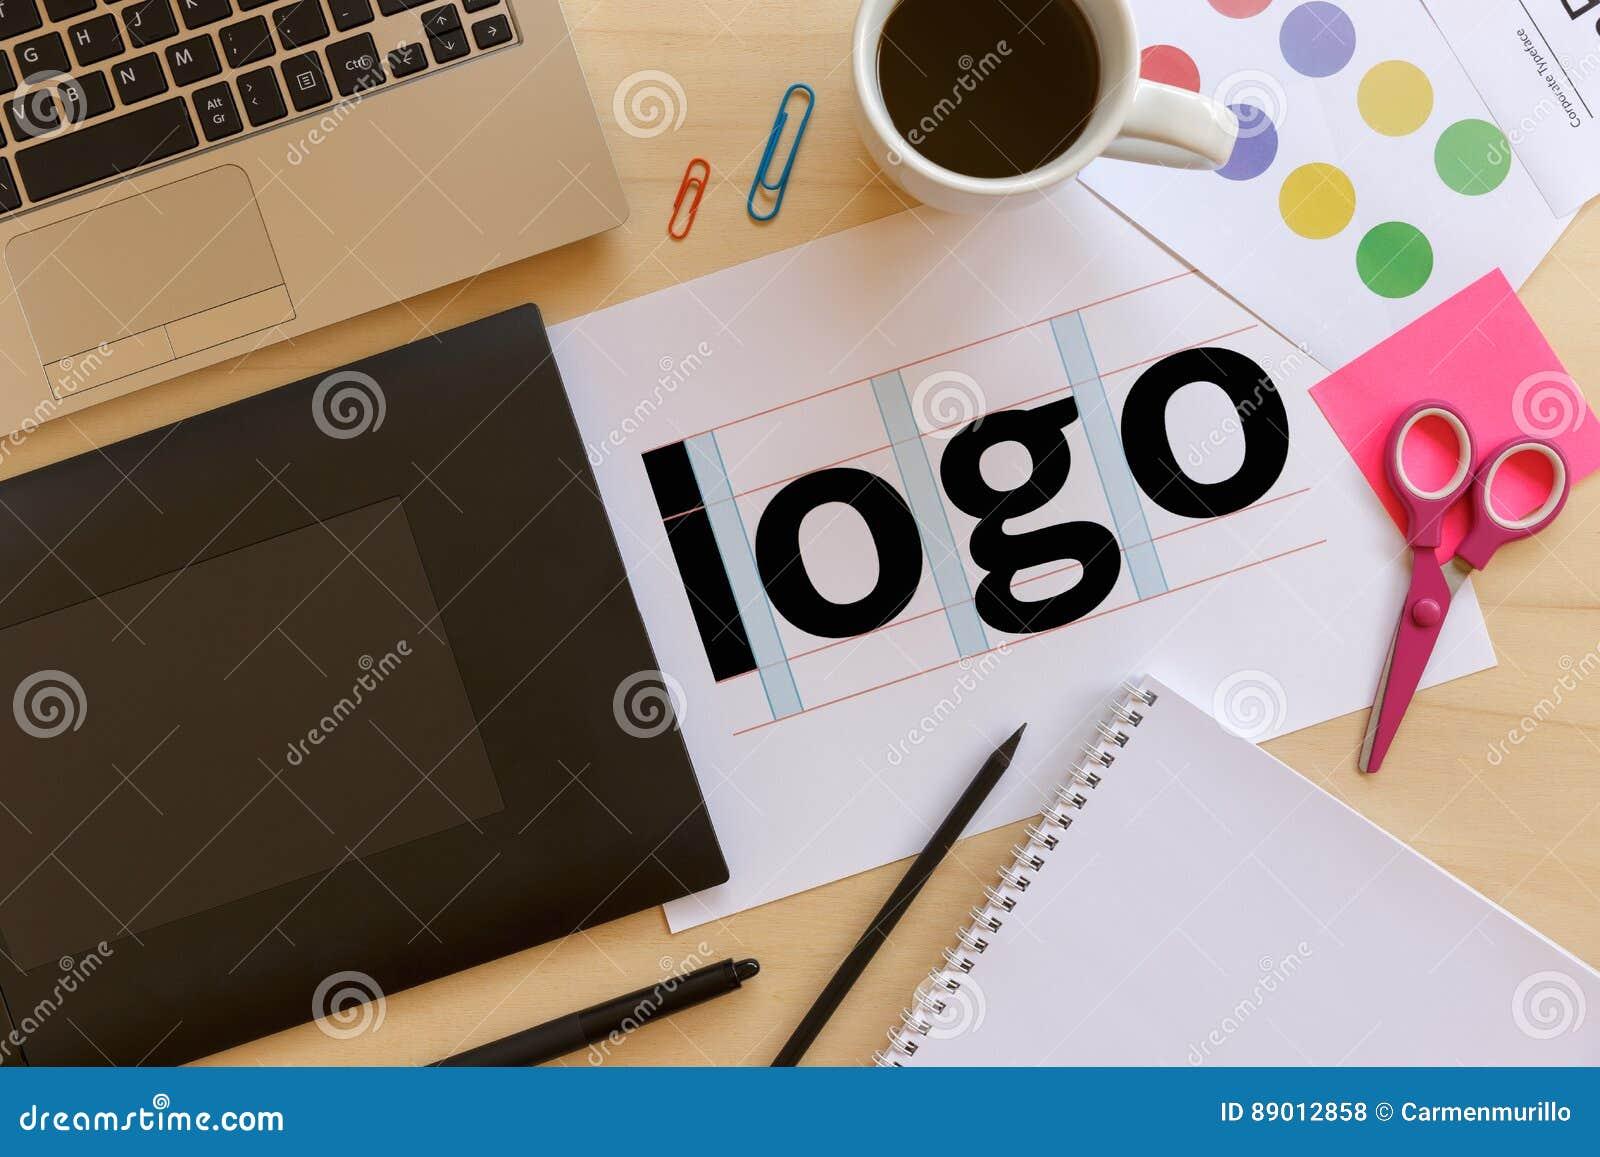 Creative graphic designer desk